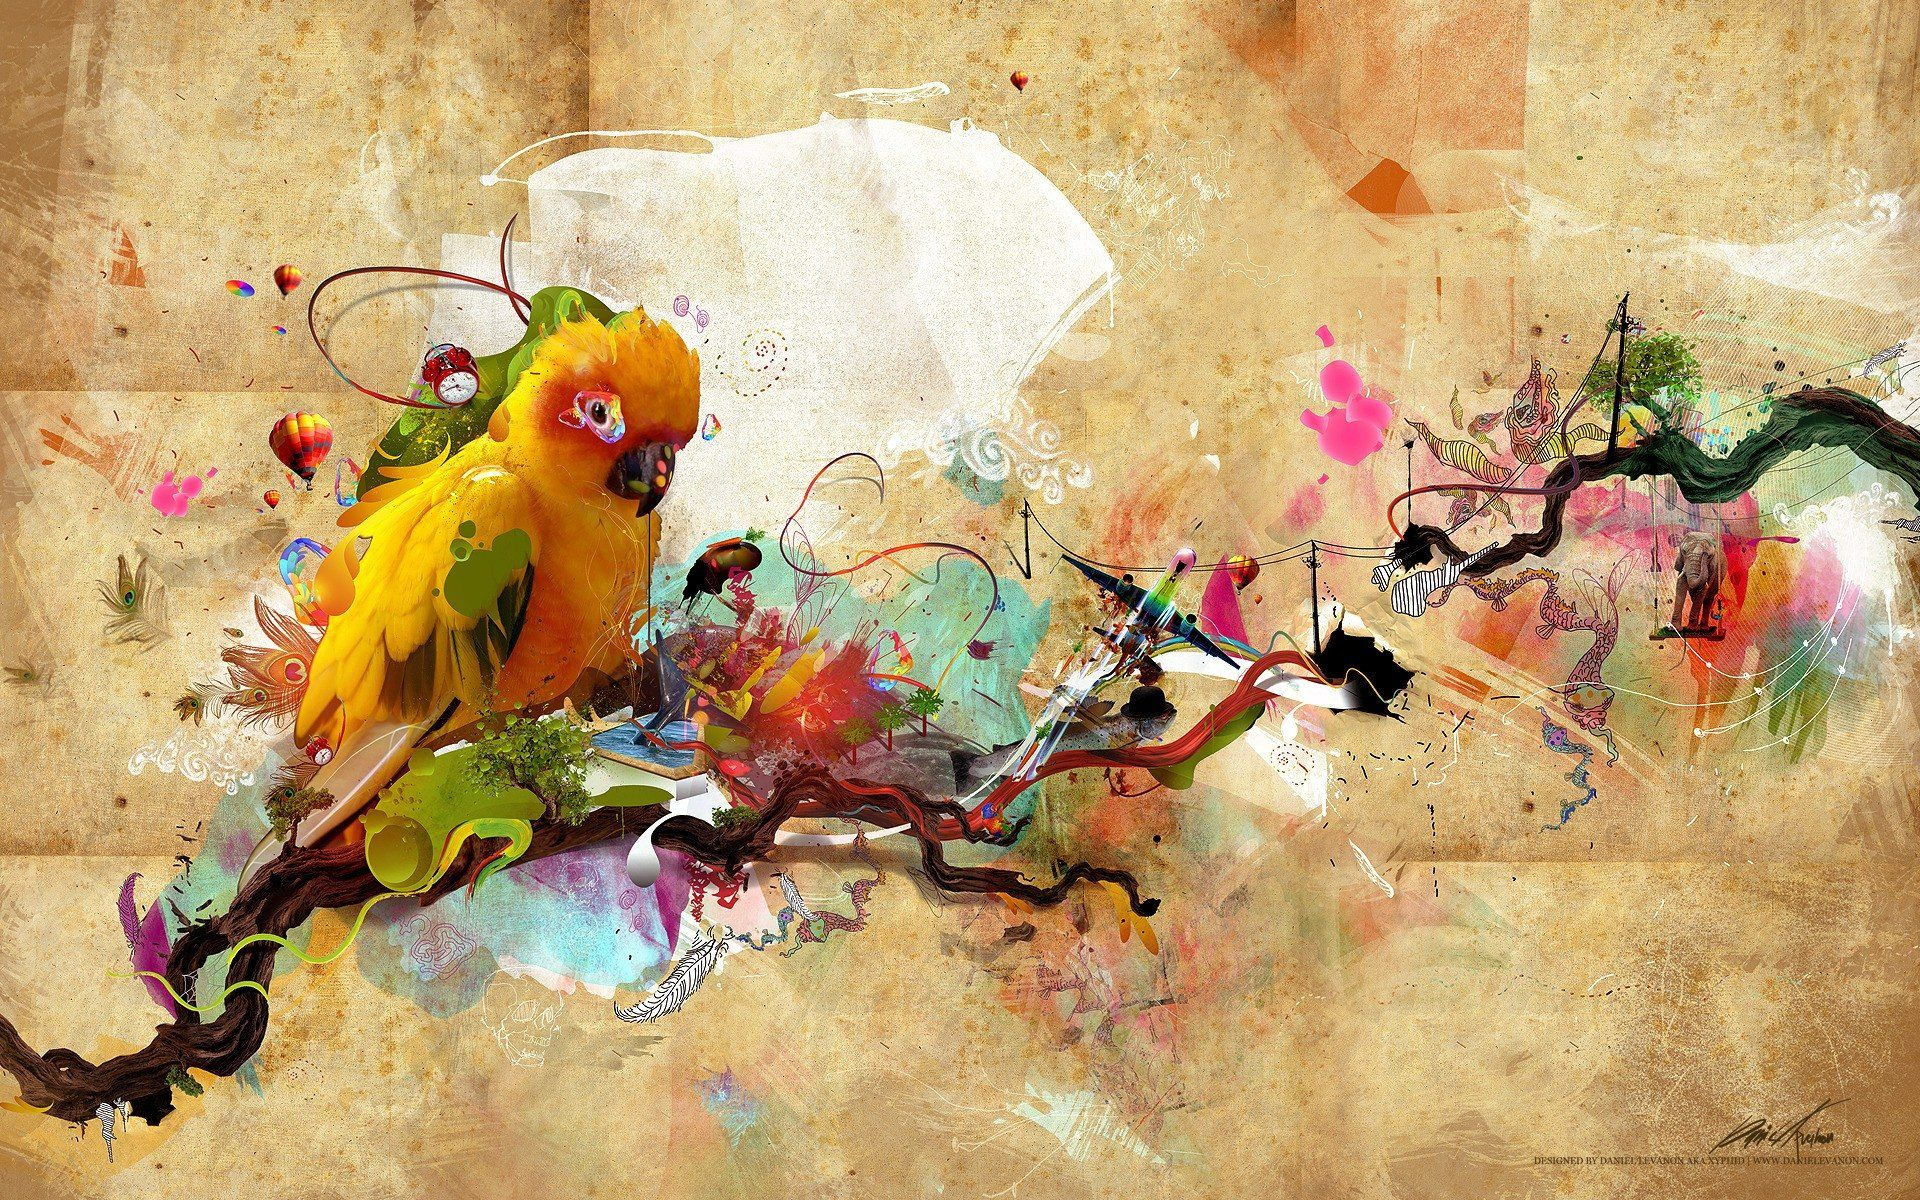 Artistic Wallpaper 1920x1200 #47017 Picks In 2019 Painting Art